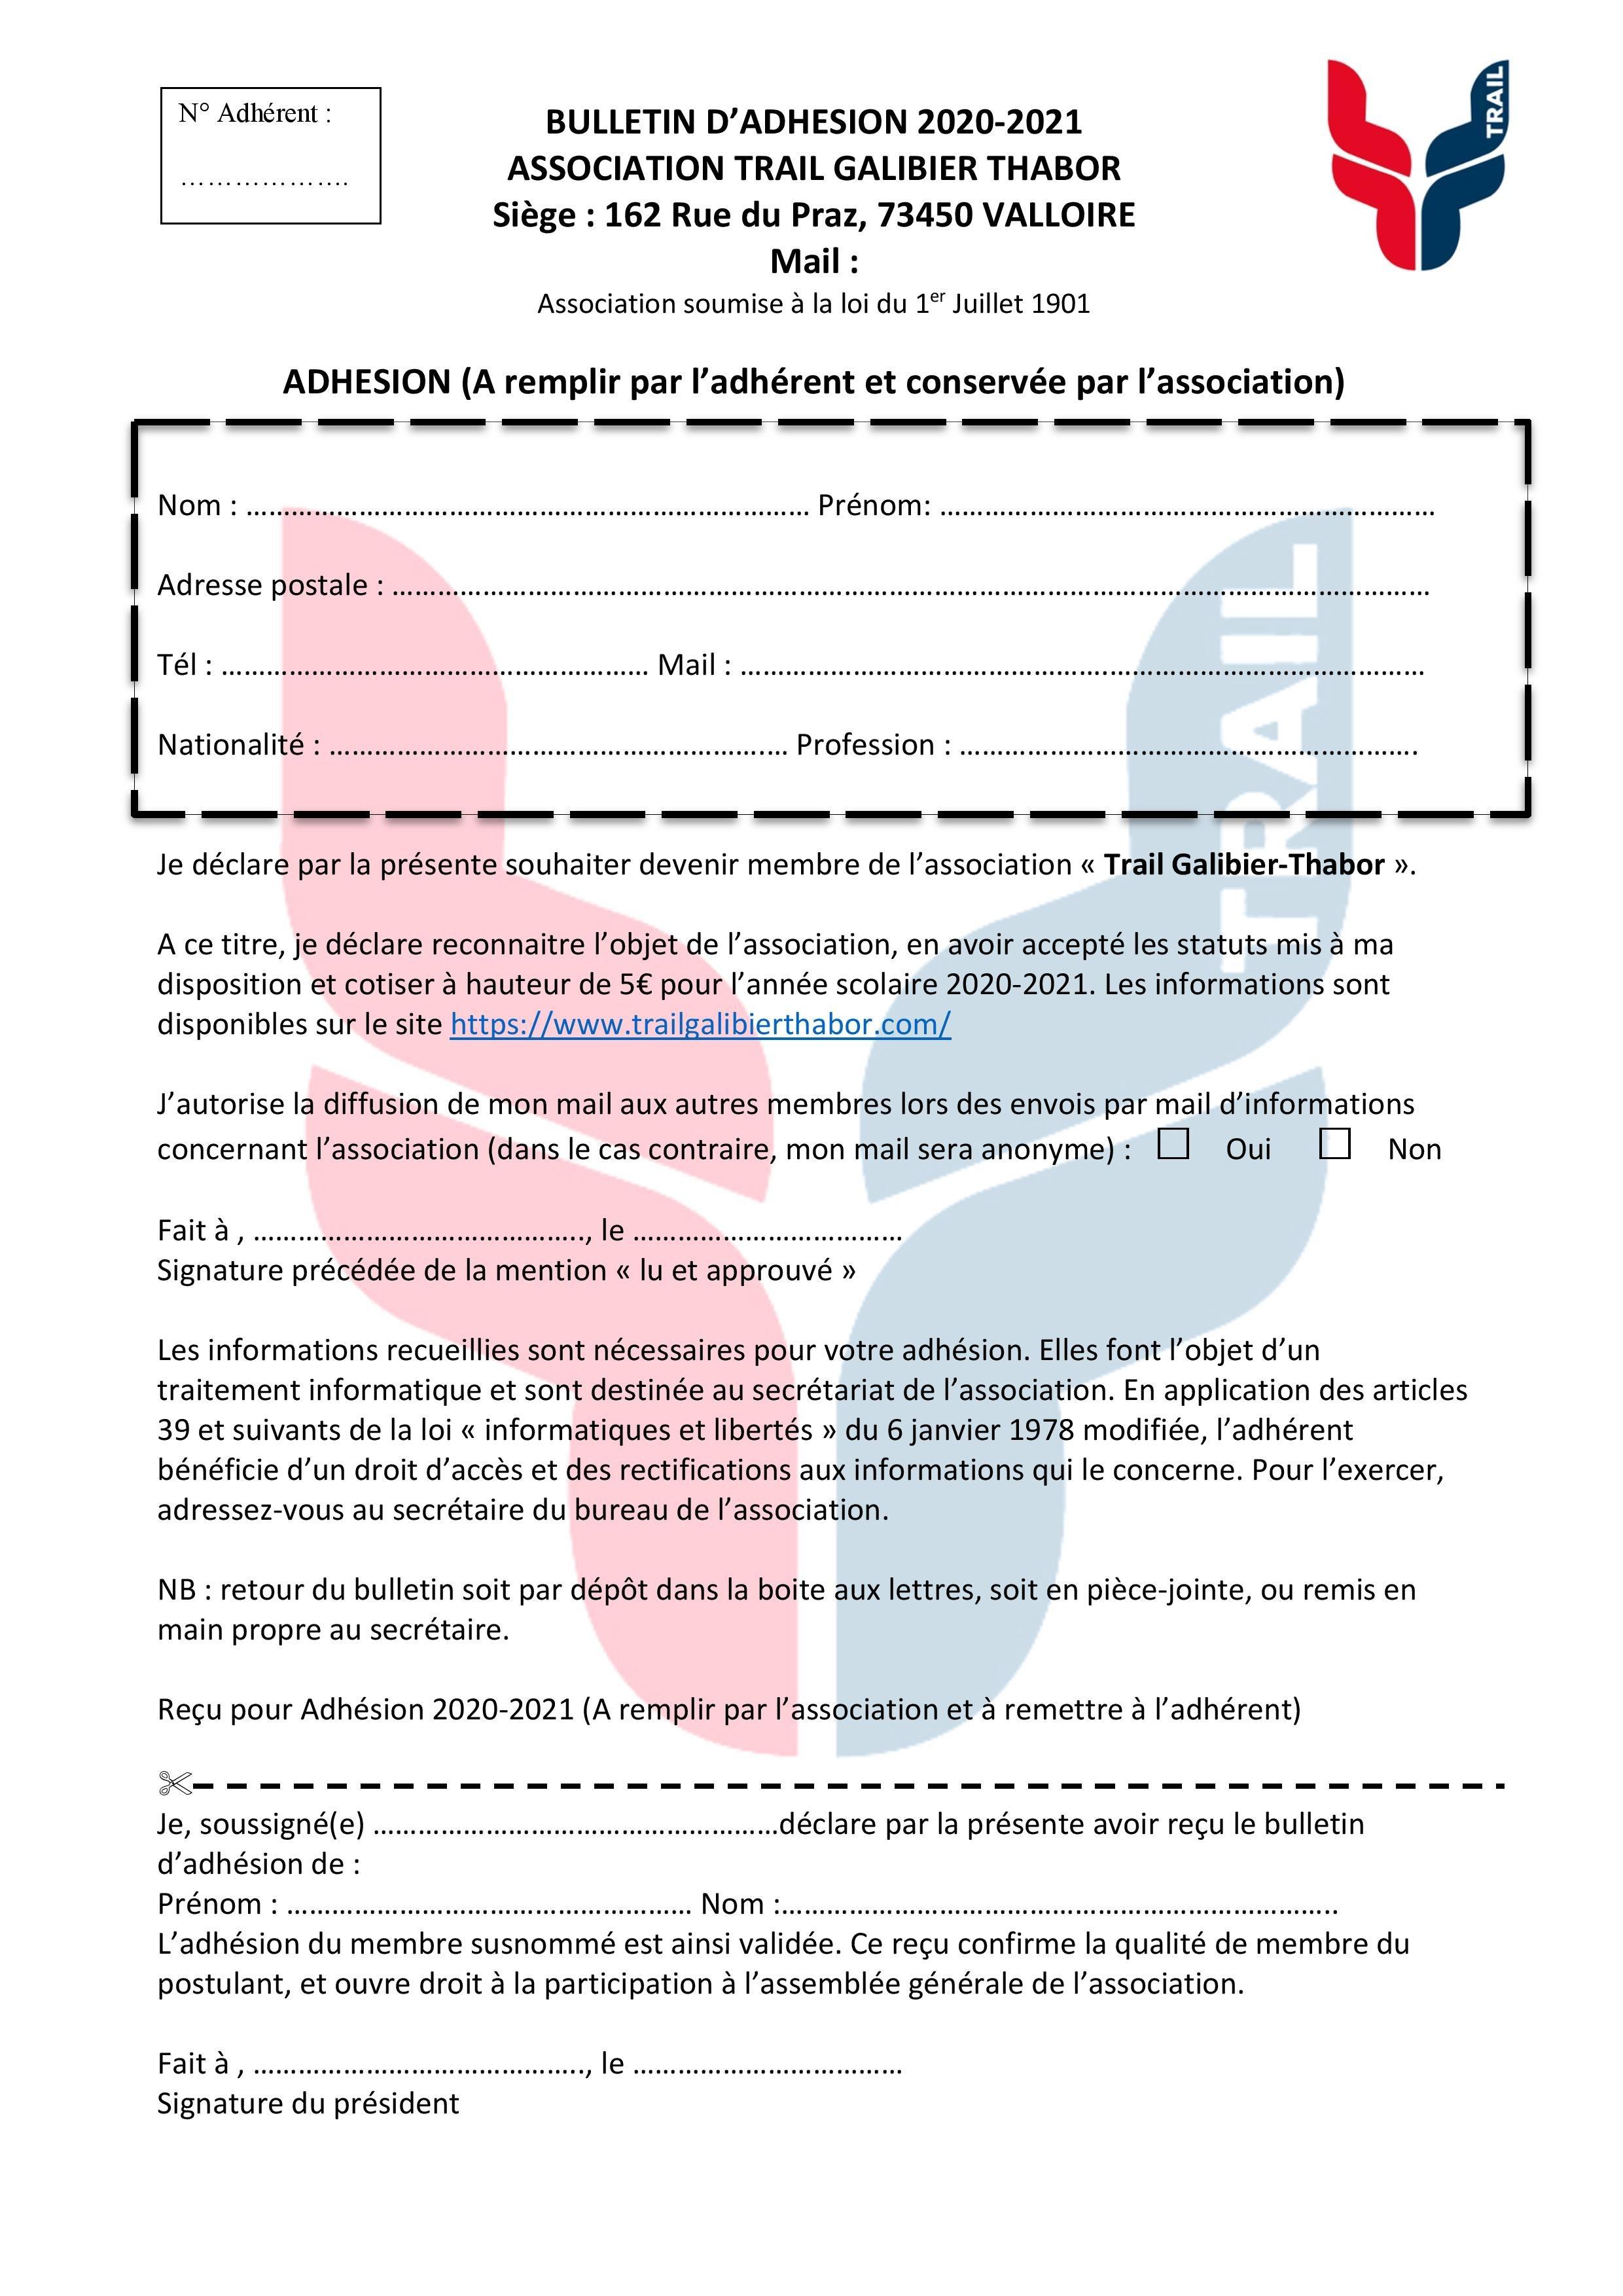 03 Bulletin adhésion TGT 2020-2021-page-001